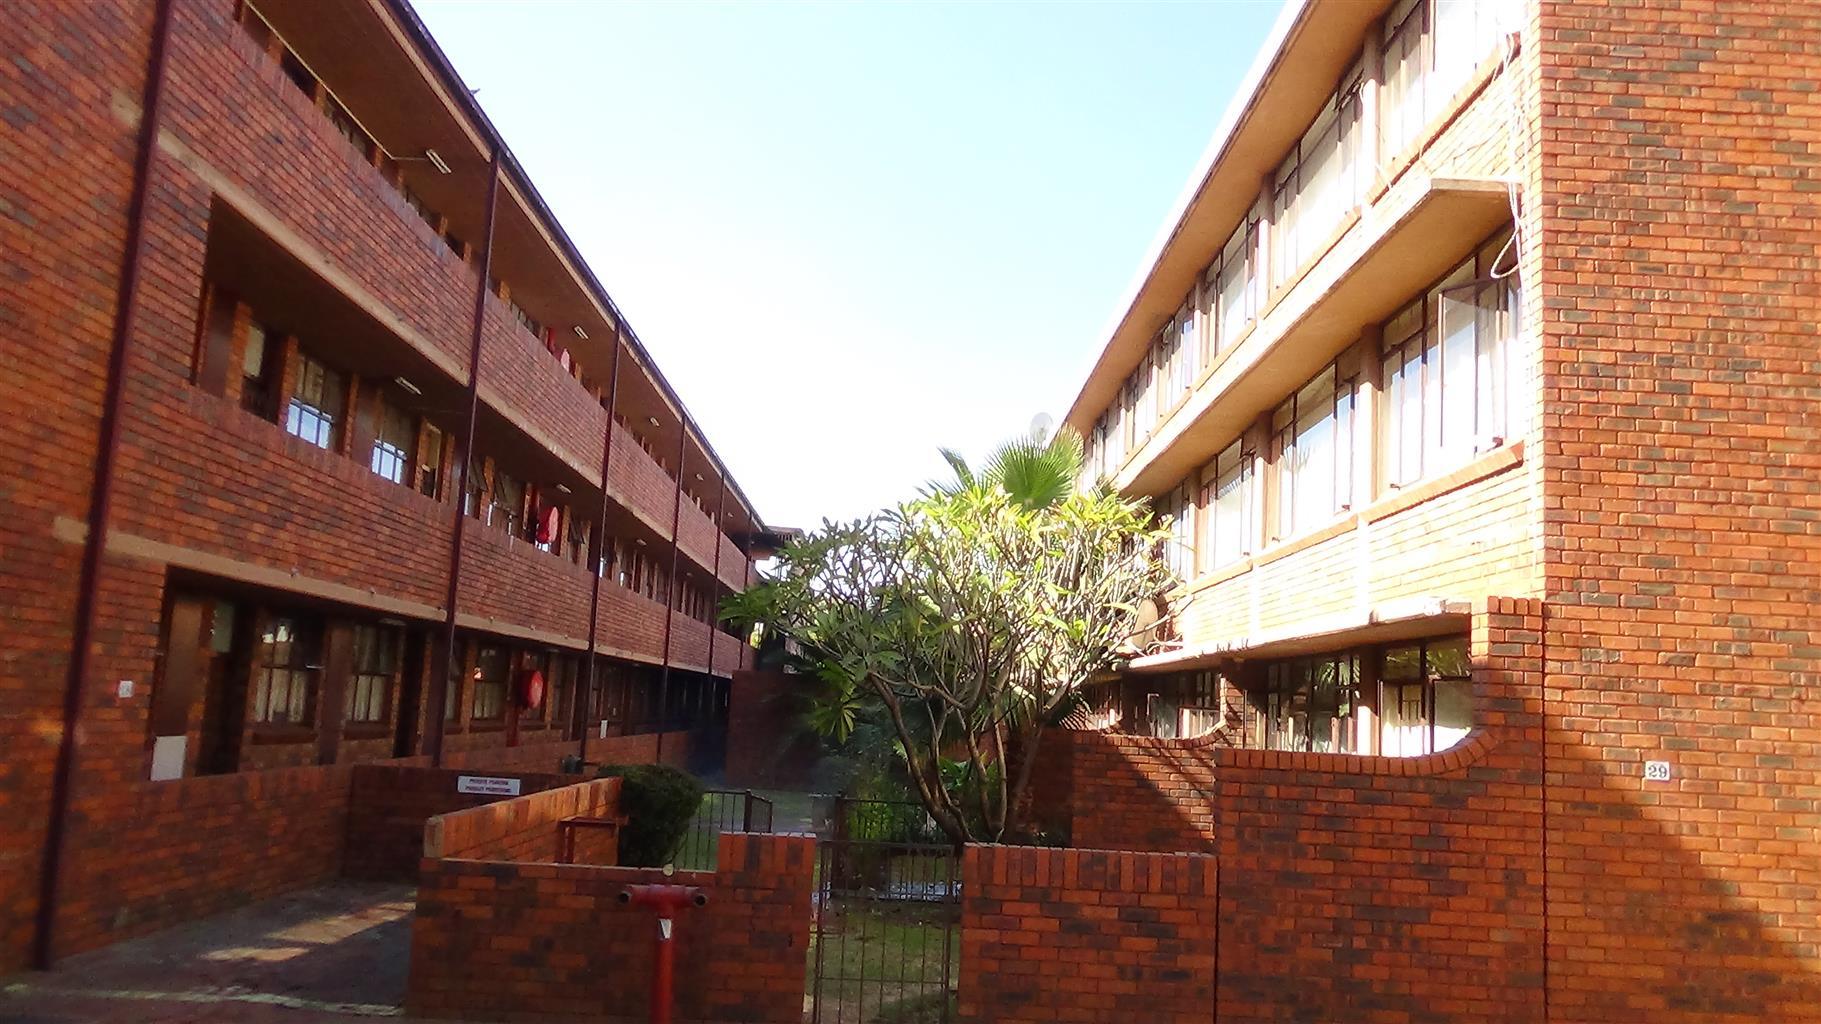 2 Bedroom Flat for Sale - Pretoria North – R 410 000